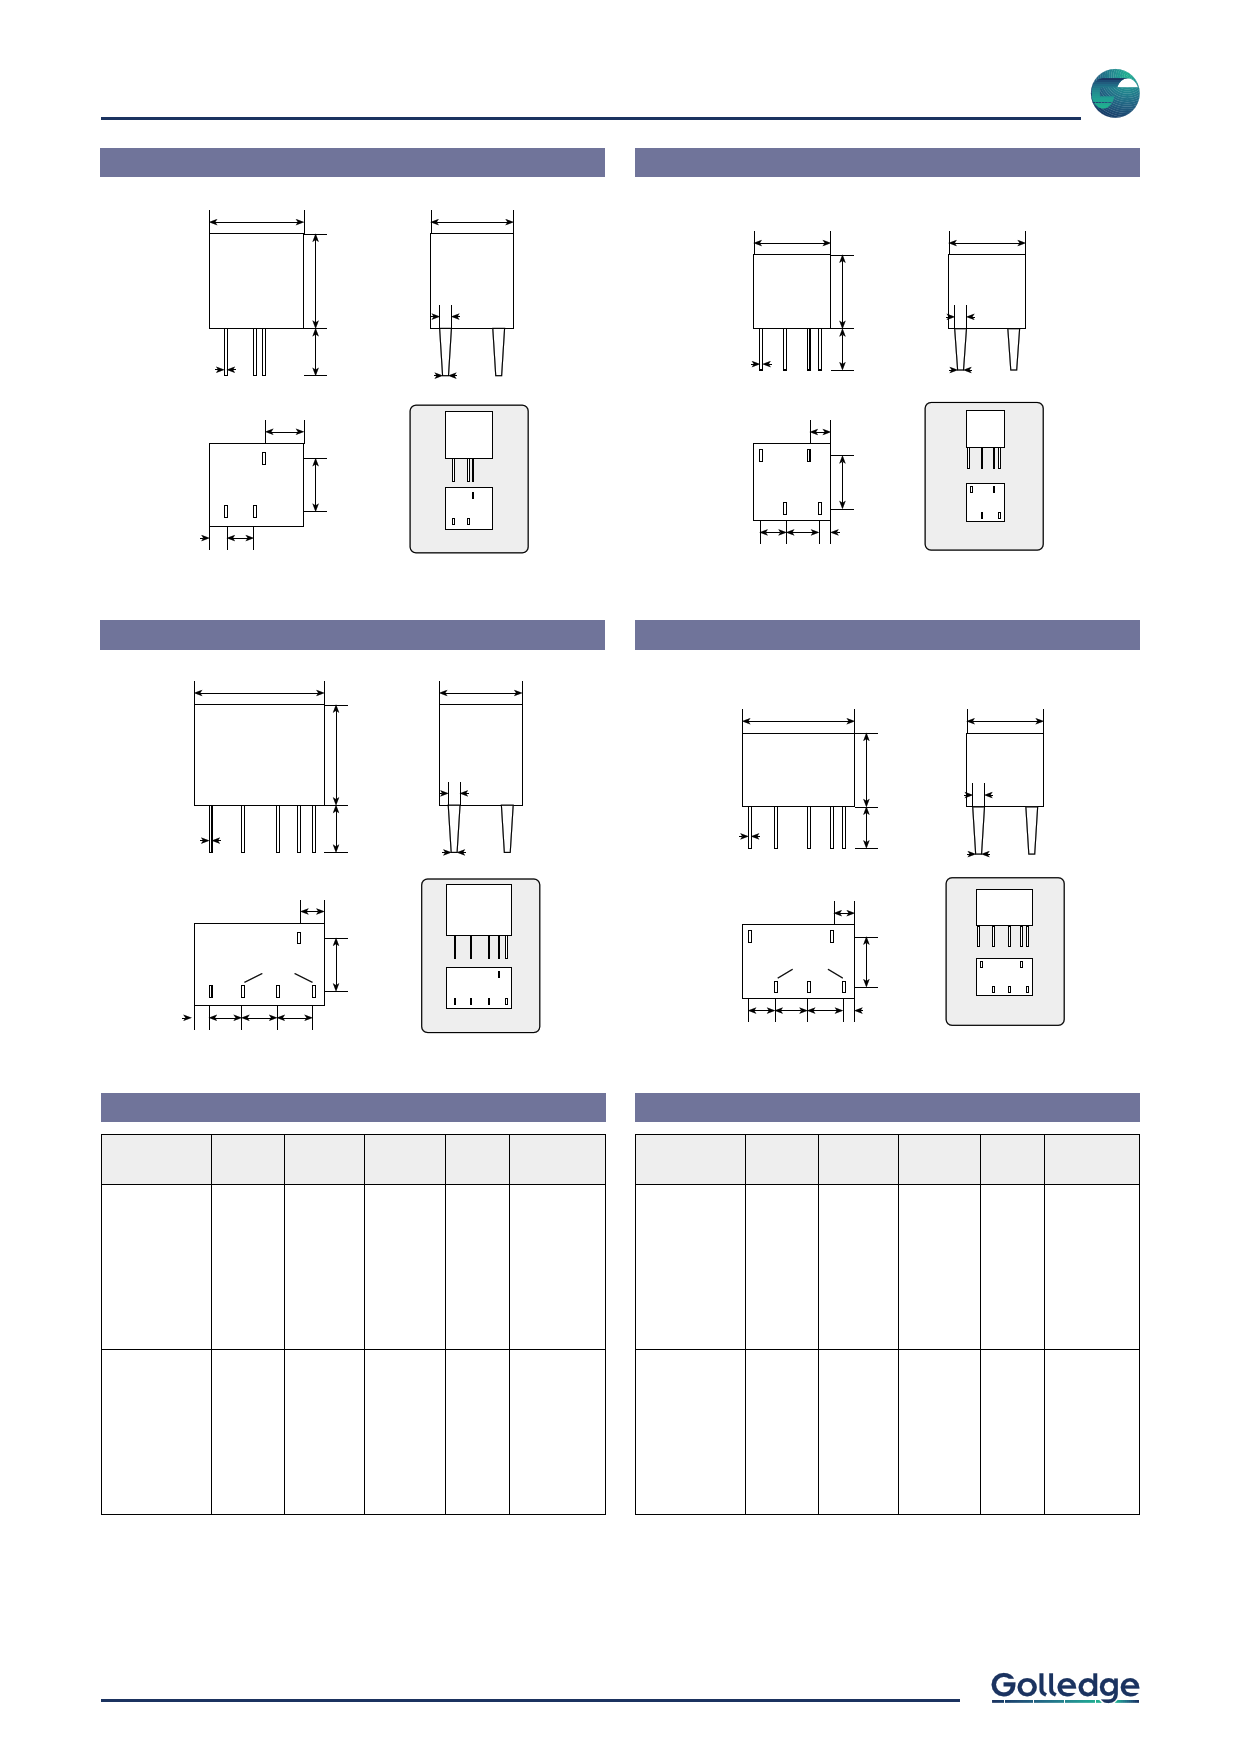 CFUCG455E datasheet